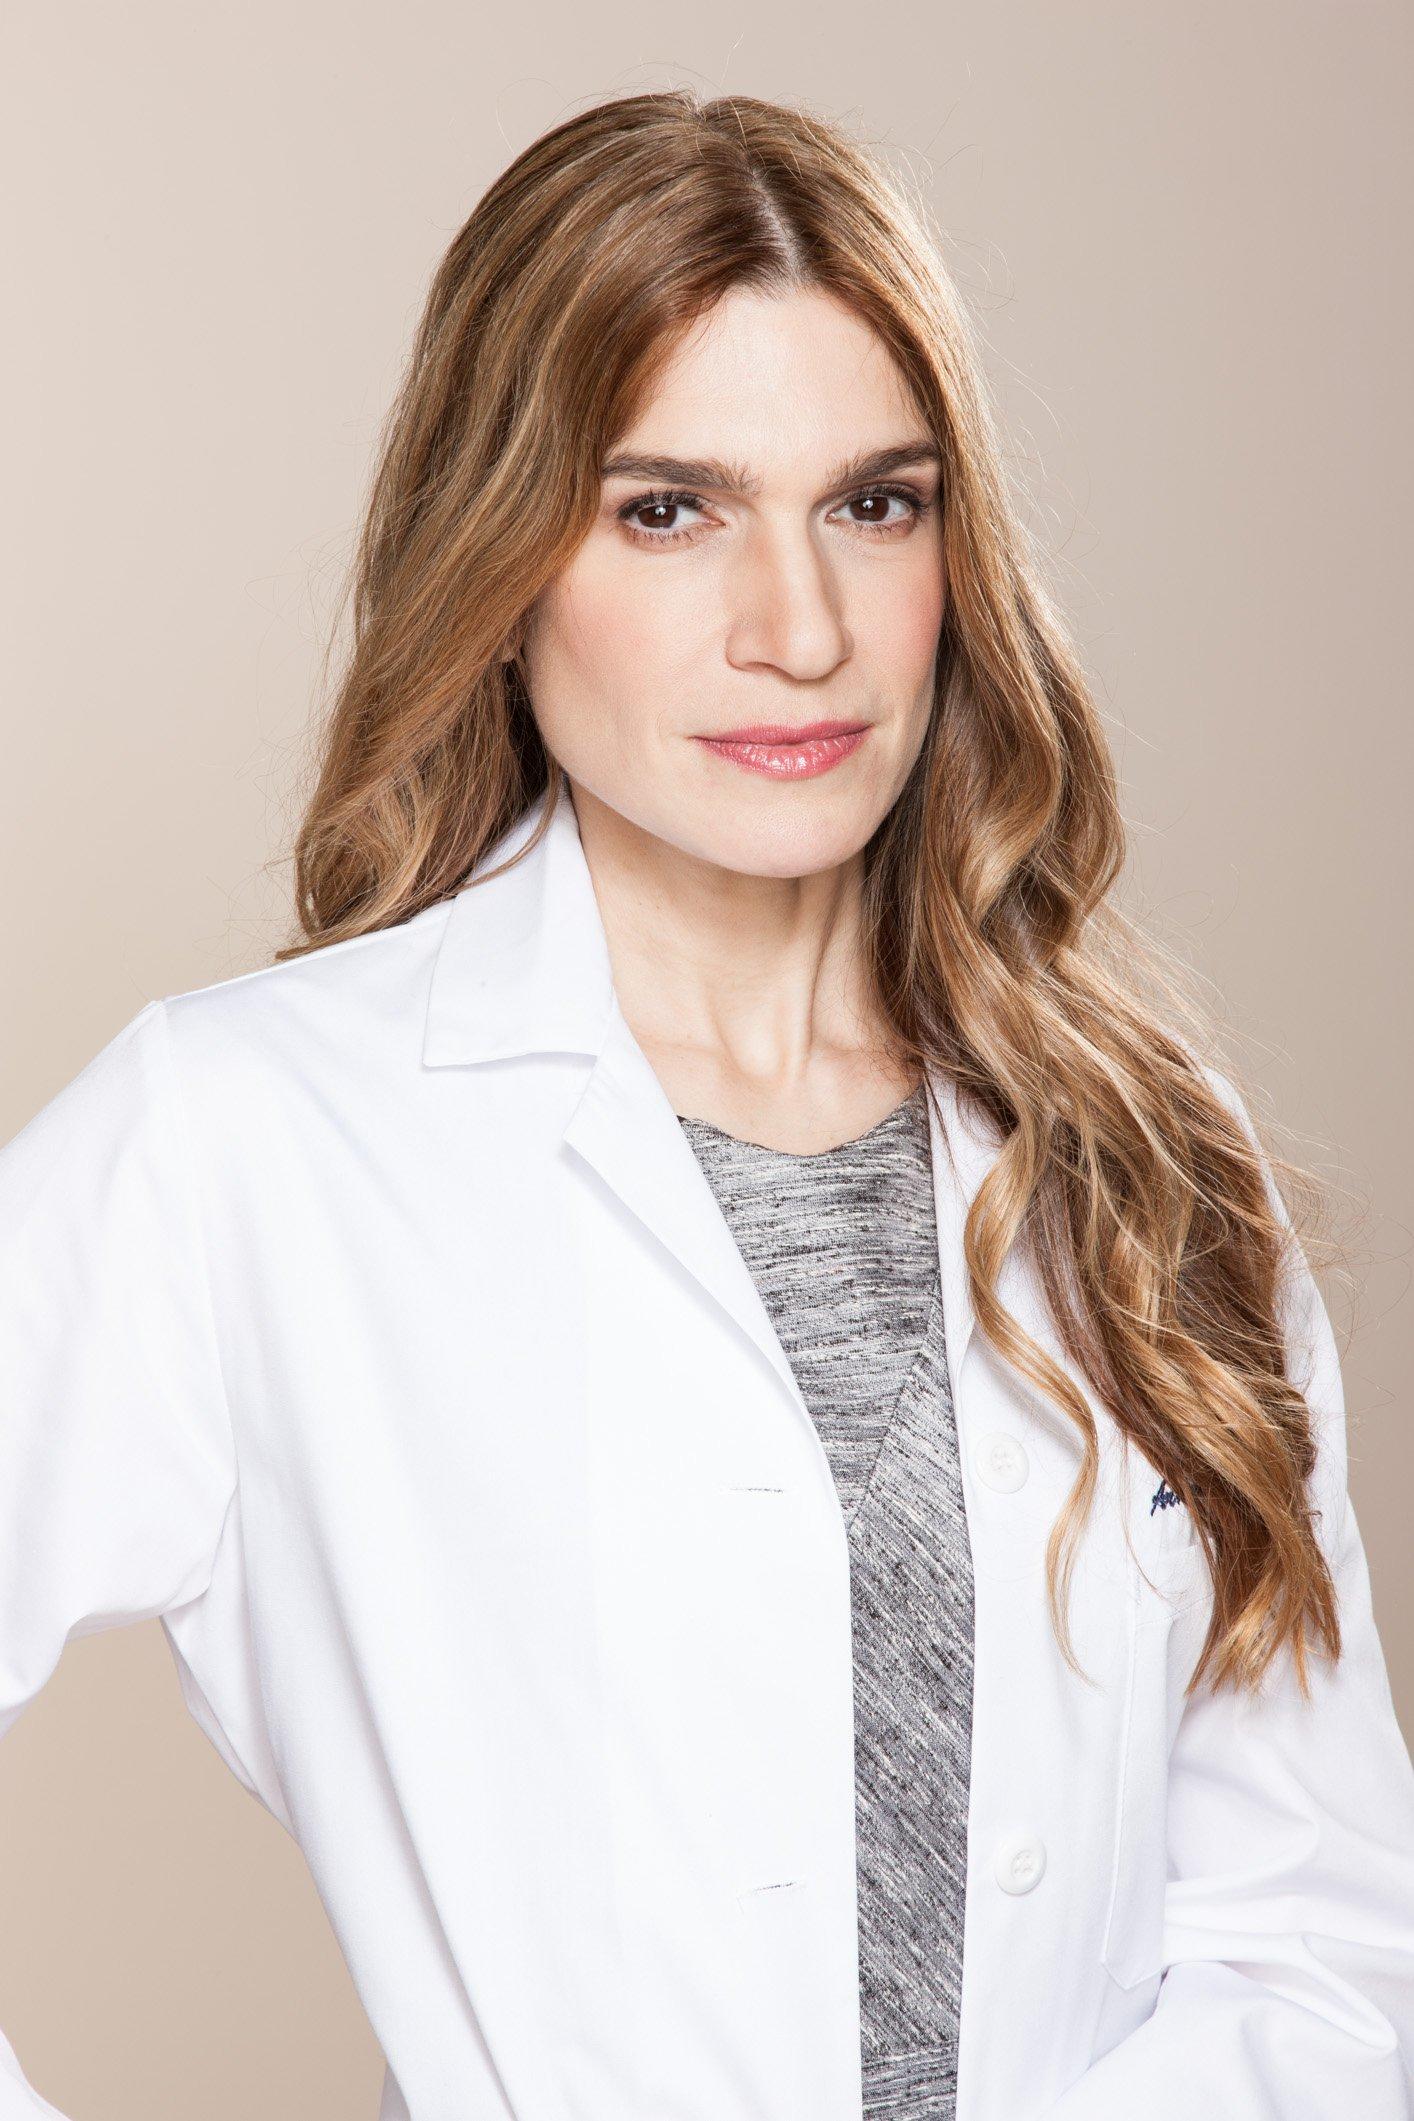 International Women's Day - Women Empowerment - Inspiring Female Entrepreneurs in Beauty - Dr. Macrene Alexiades